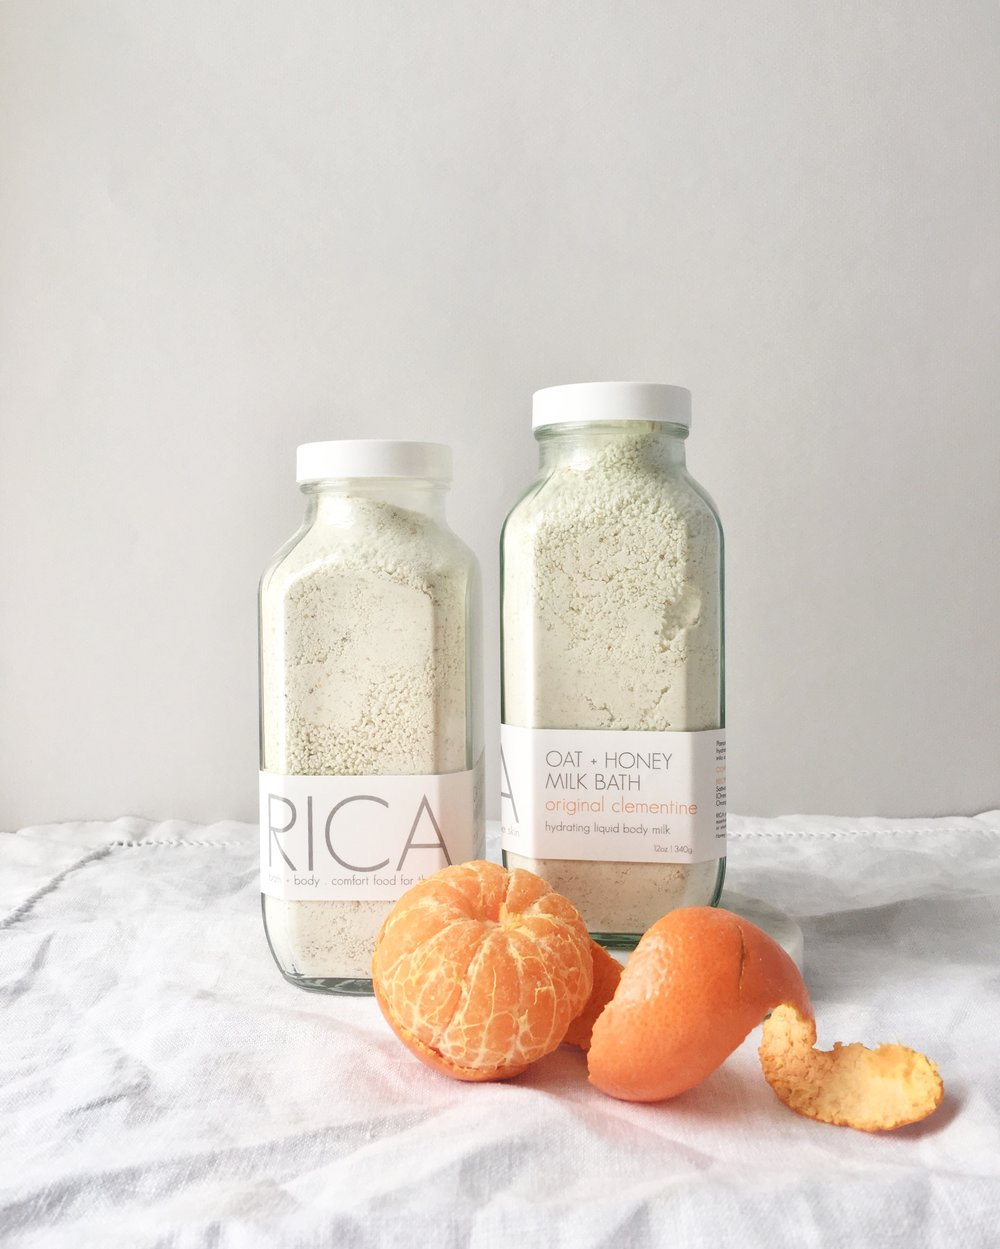 RICA bath + body Oat + Honey Milk Bath.JPG